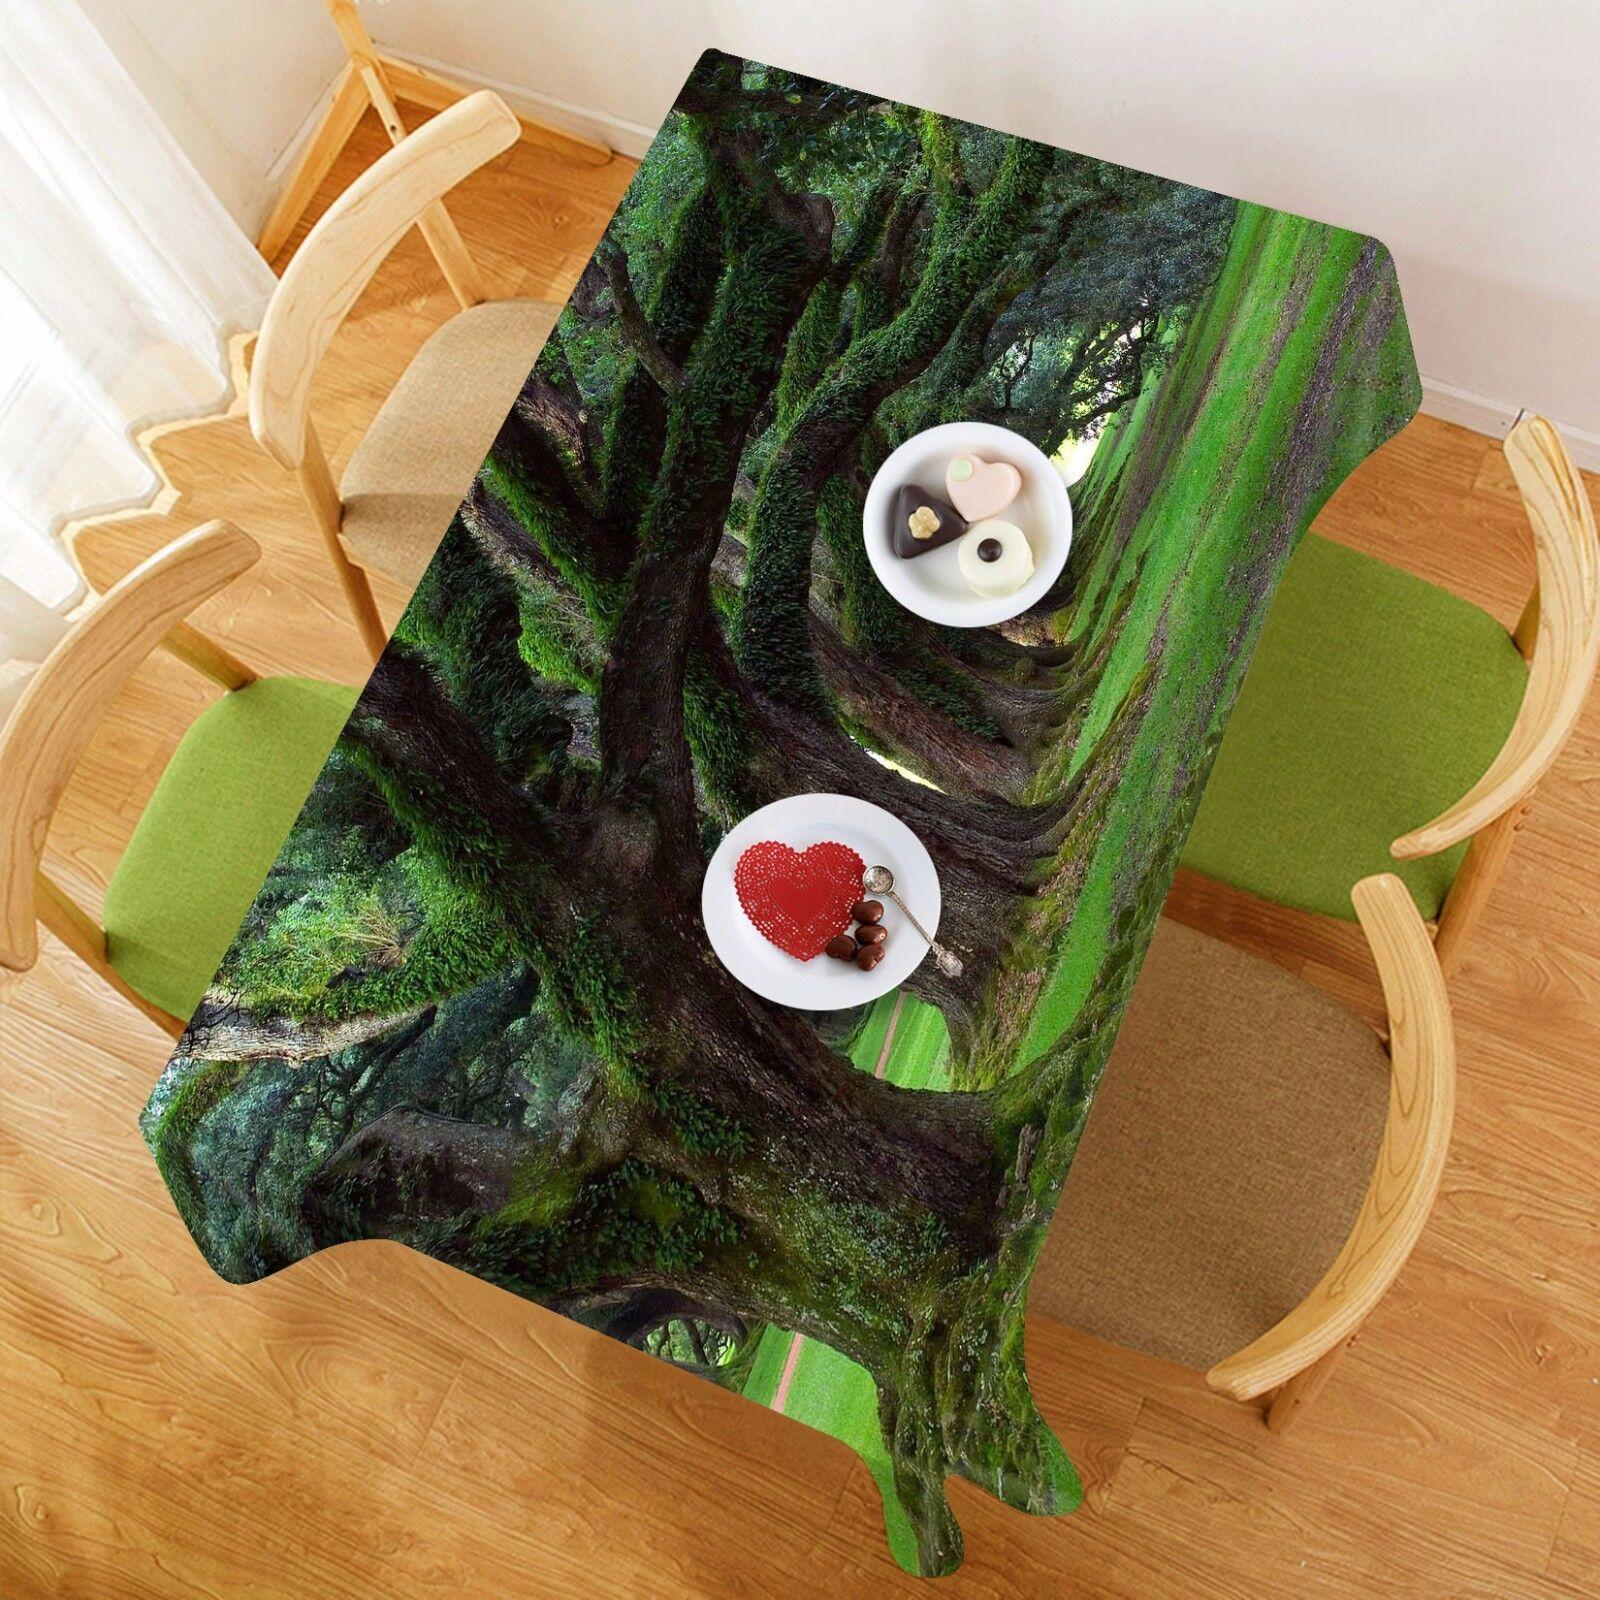 3D Lawn Green Tablecloth Table Cover Cloth Birthday Party AJ WALLPAPER UK Lemon